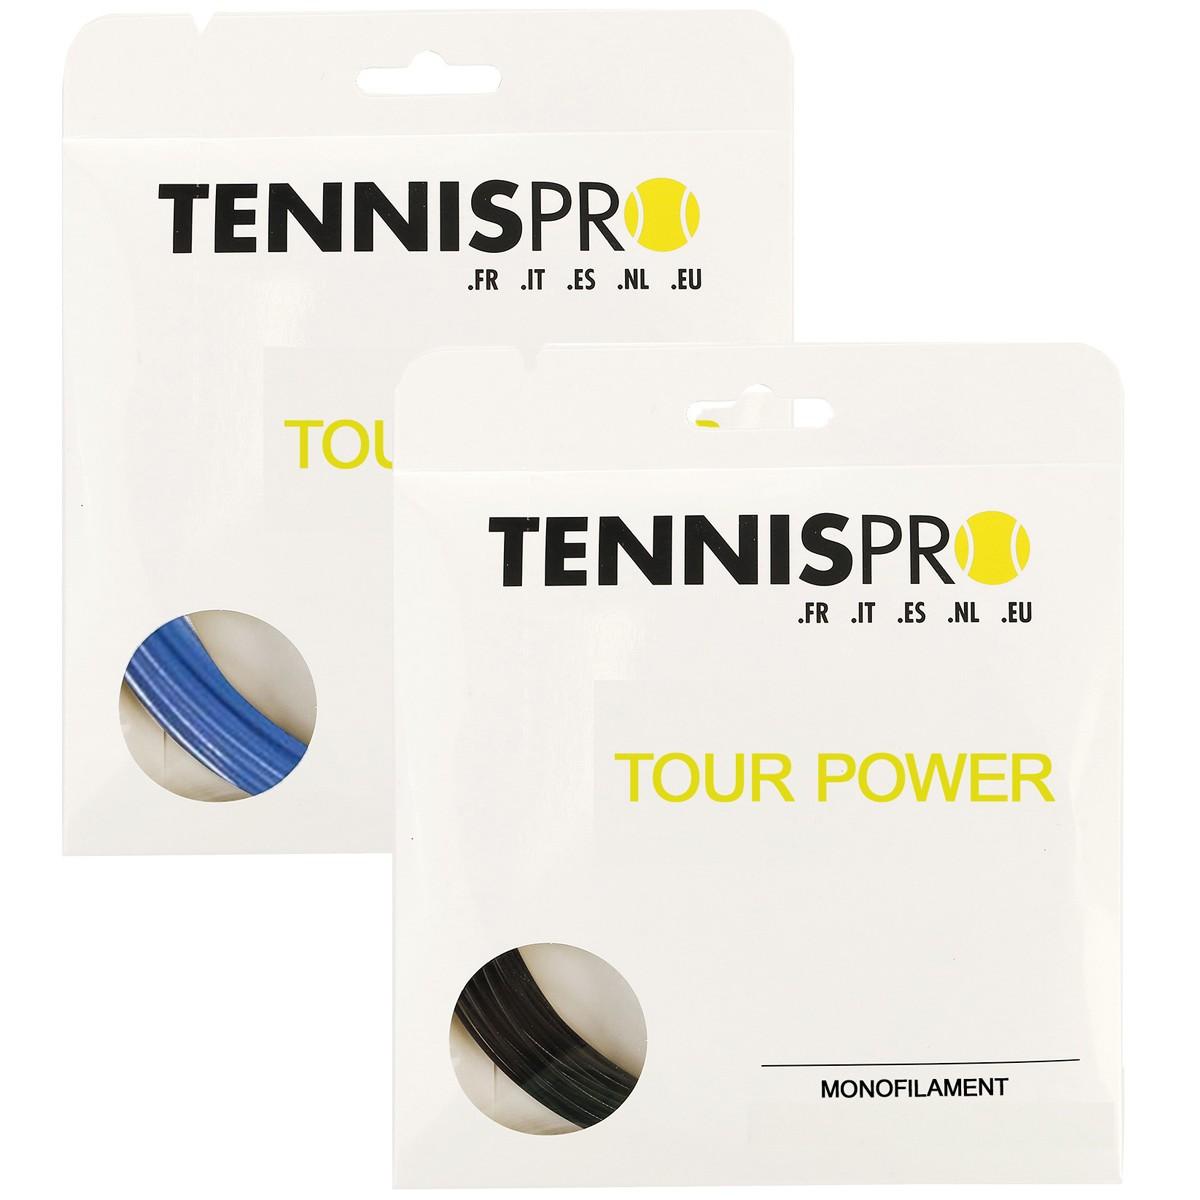 CORDAGE TENNISPRO TOUR POWER (12 METRES)